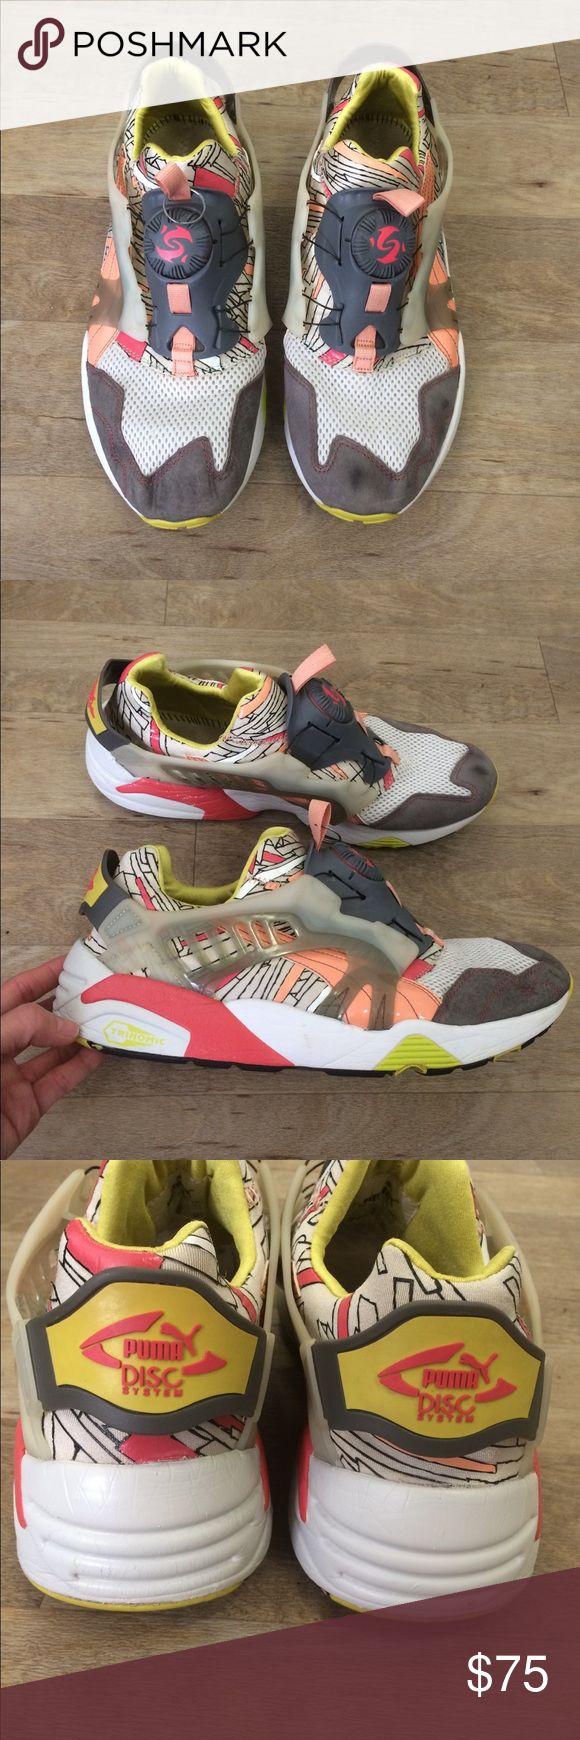 Puma Disc System Retro Size 9.5 Size 9.5 Puma Shoes Sneakers